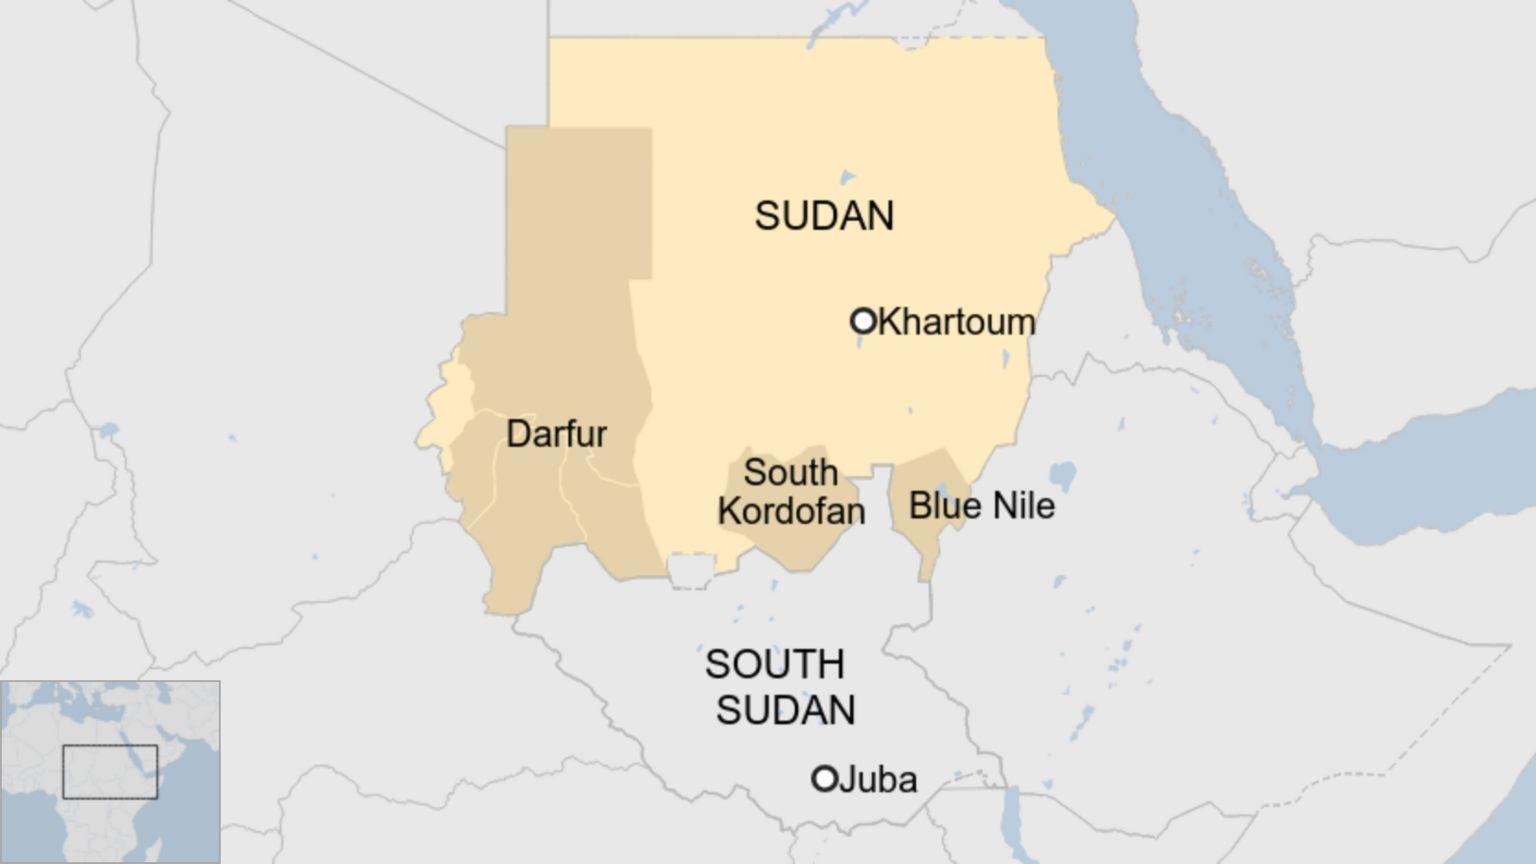 Map of Sudan showing Darfur, South Kordofan and Blue Nile